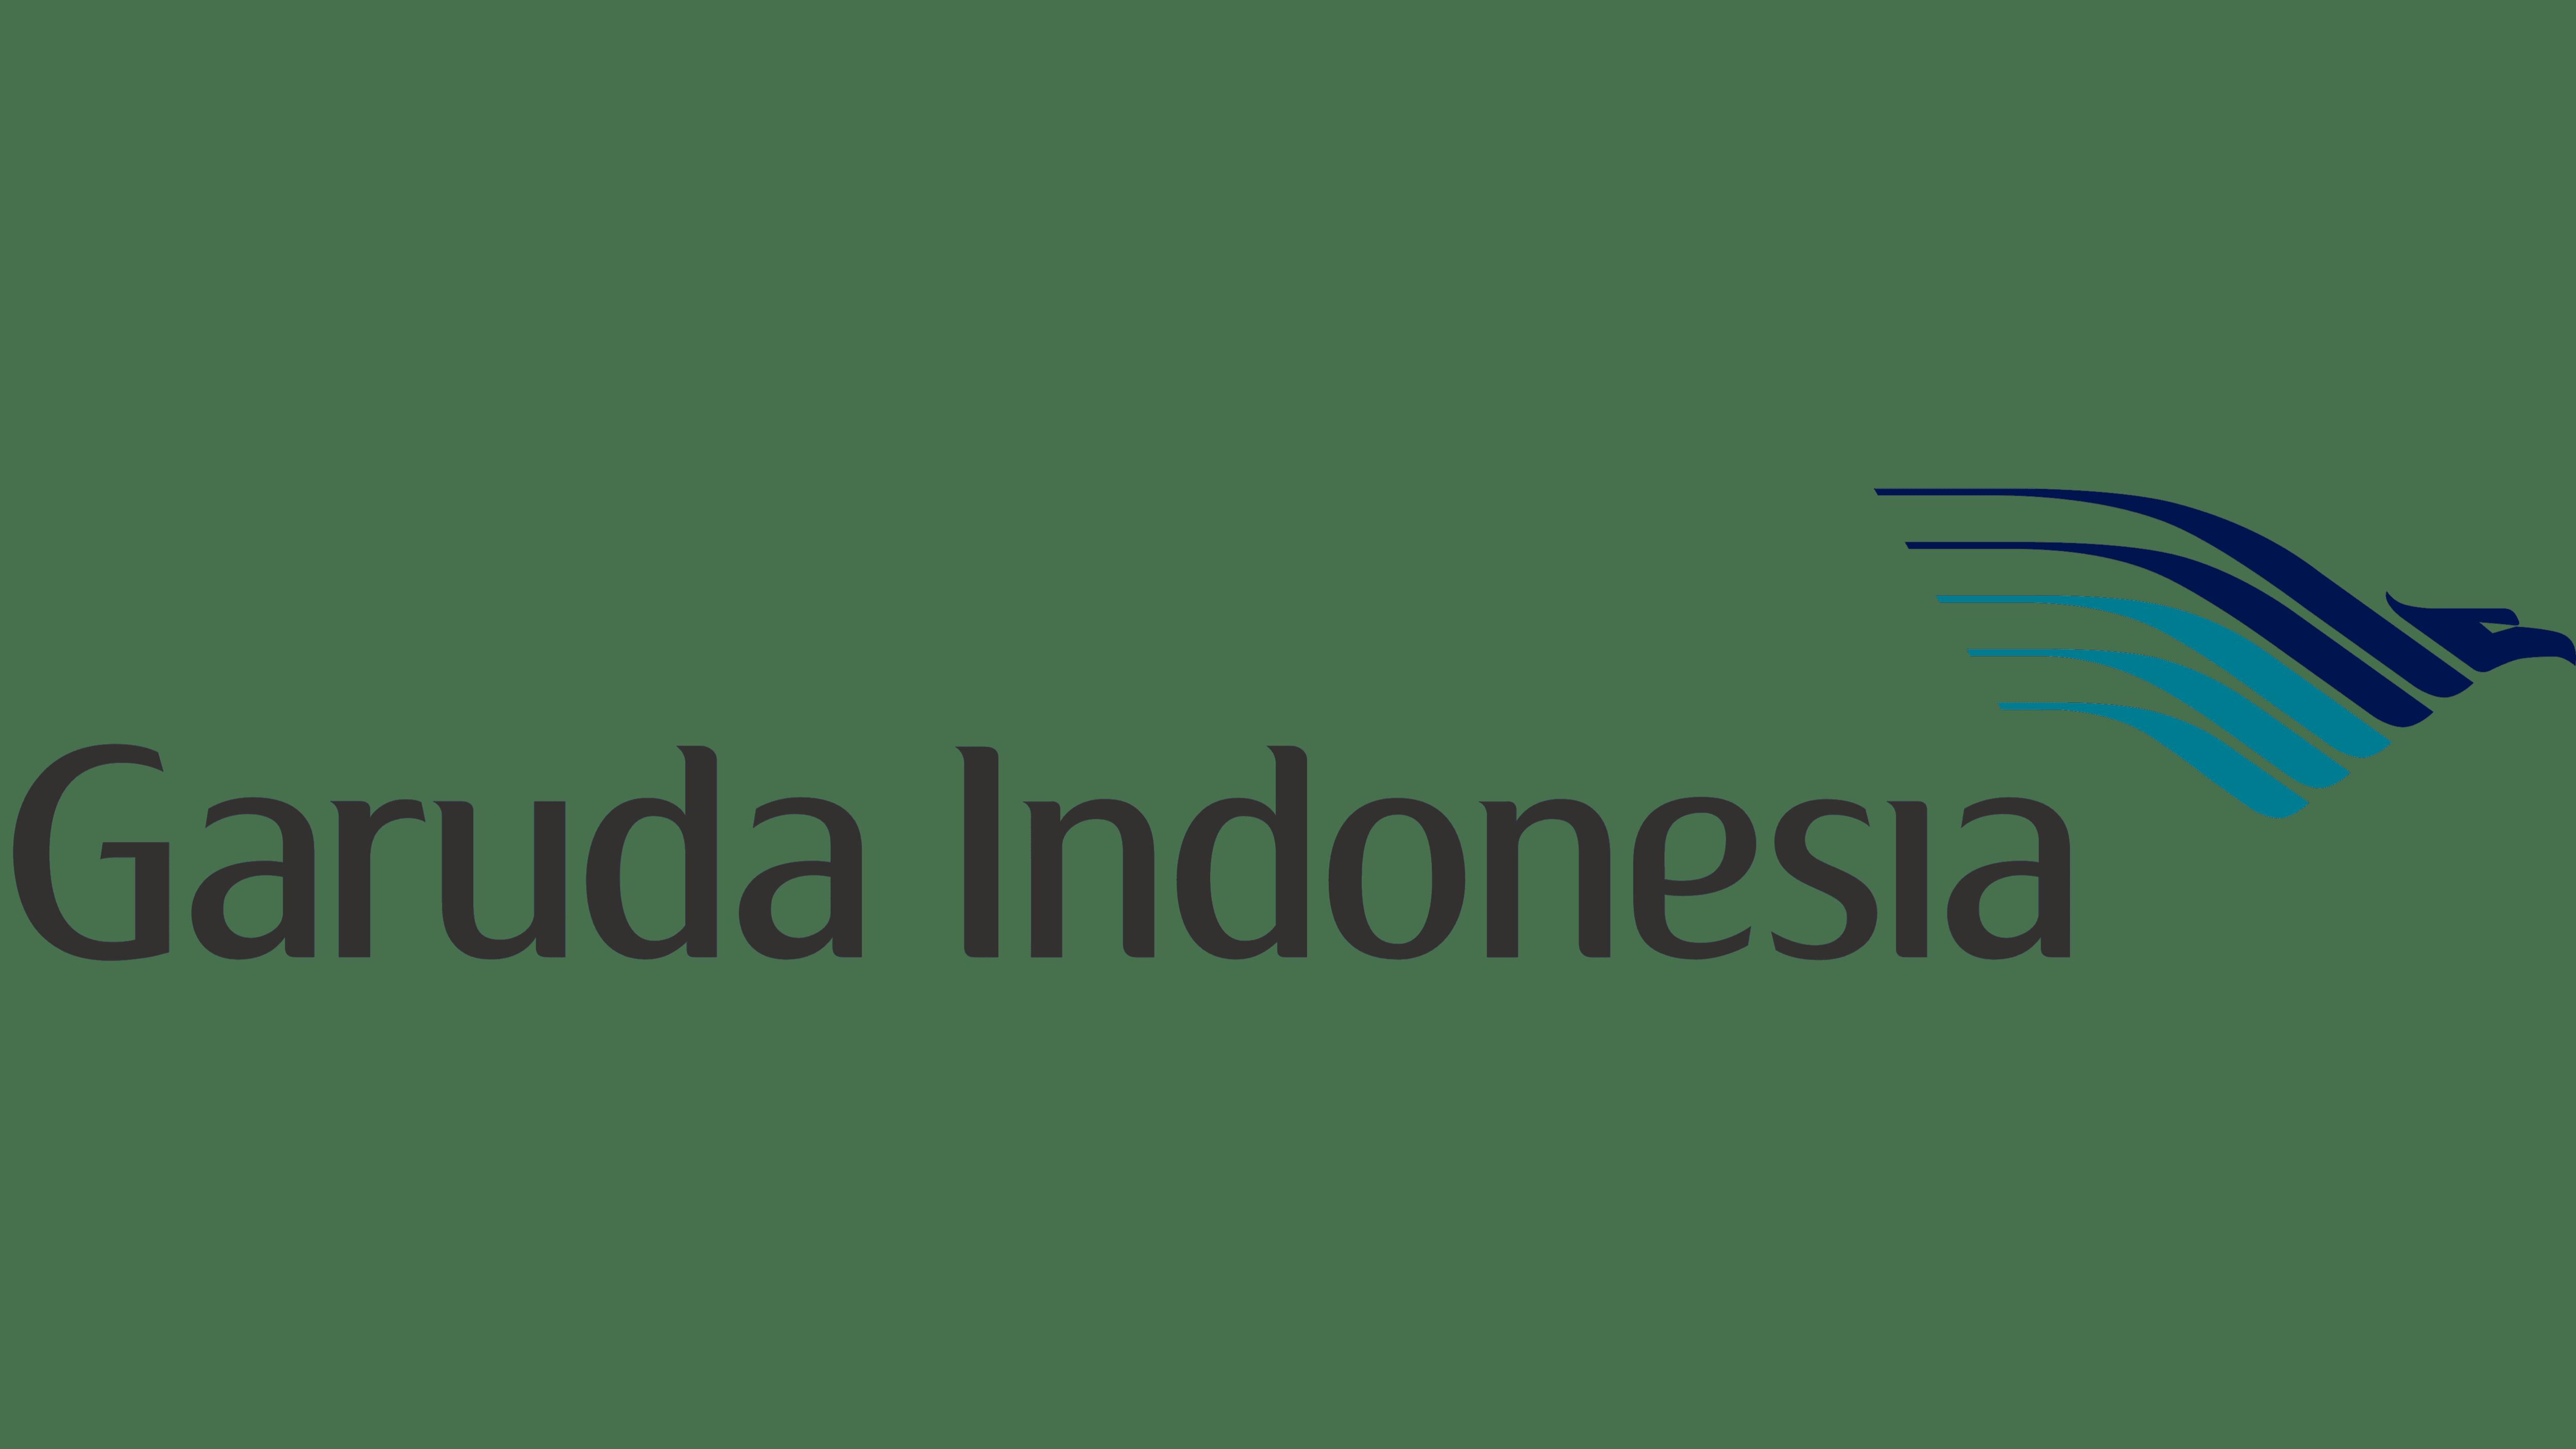 Garuda Indonesia Logo Logo